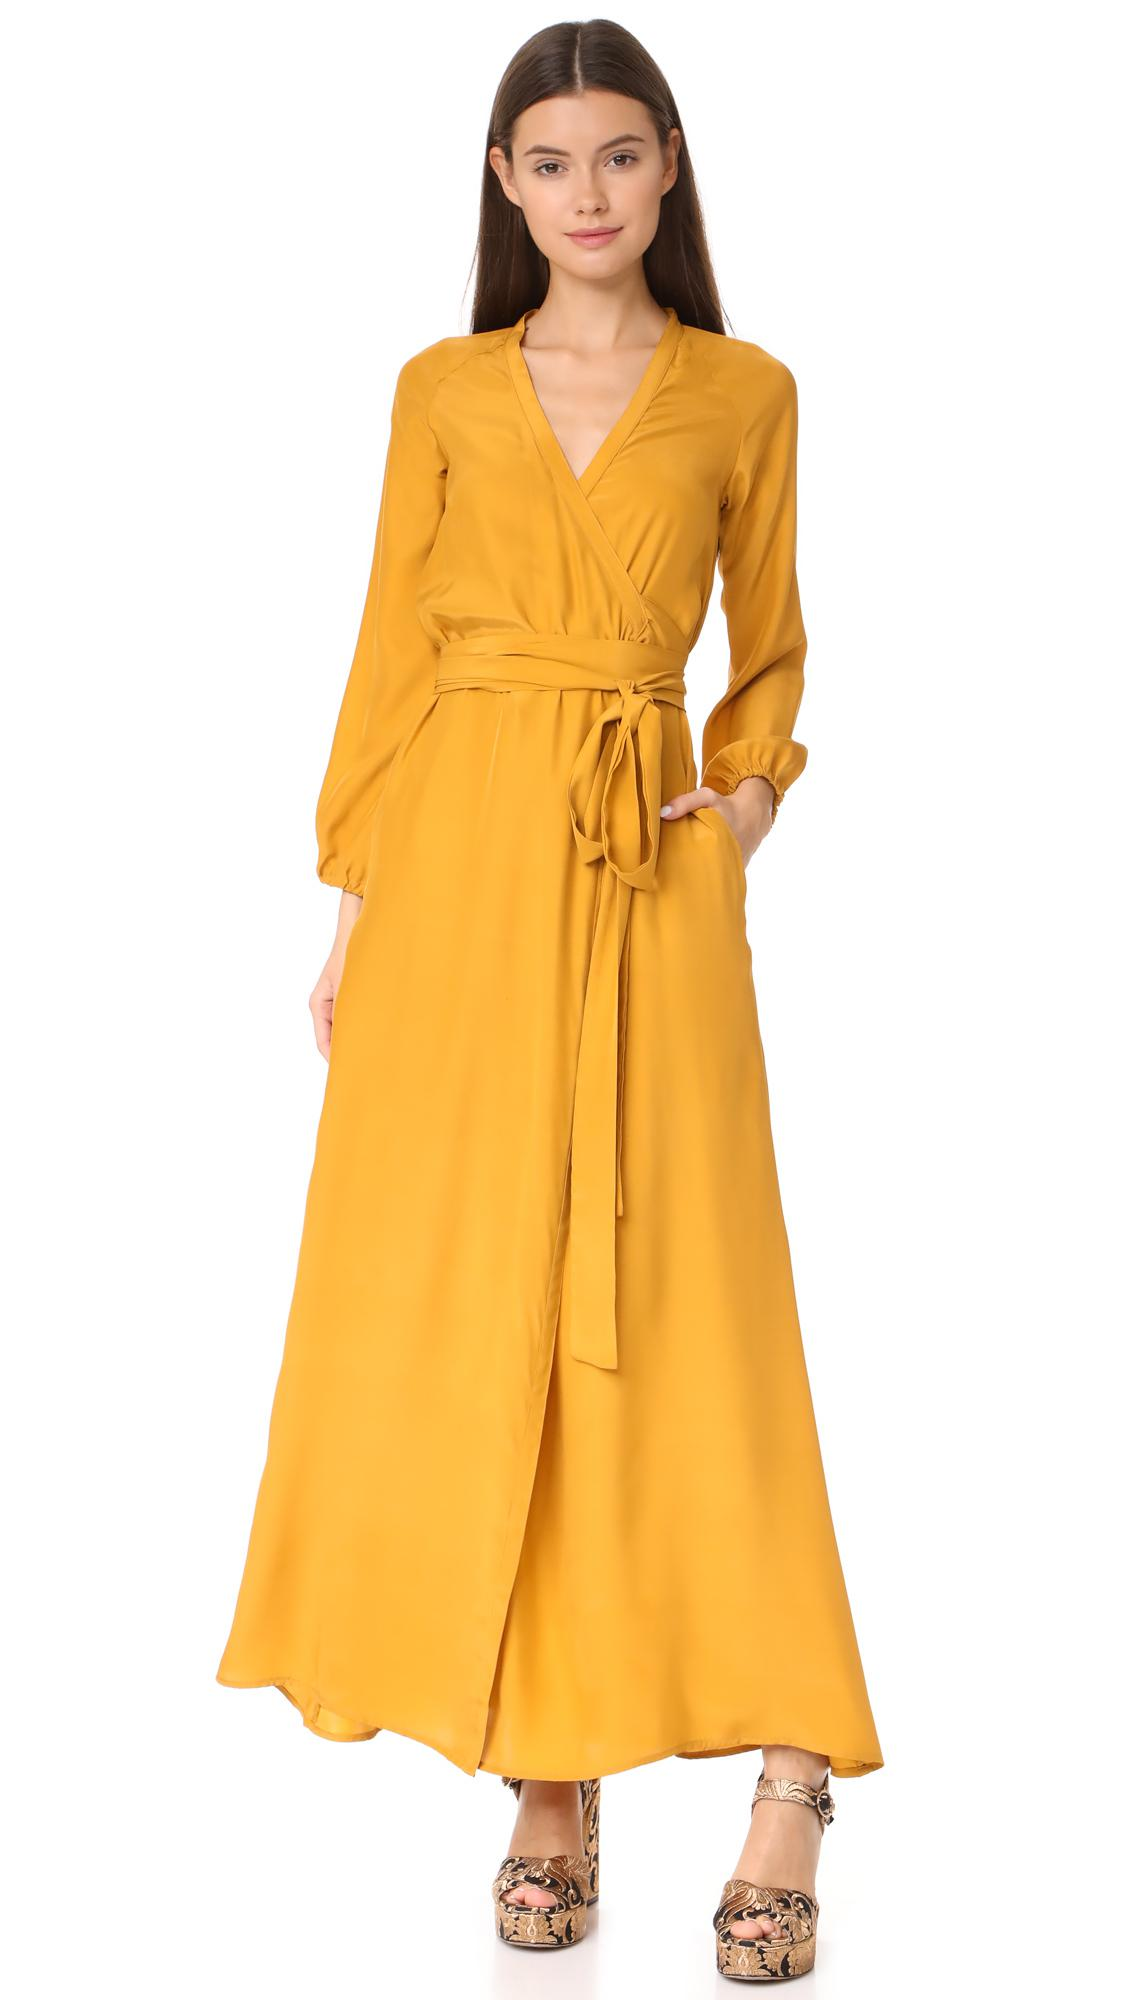 5878efdbd3f7 Rhode Resort Jagger Wrap Dress in Yellow - Lyst